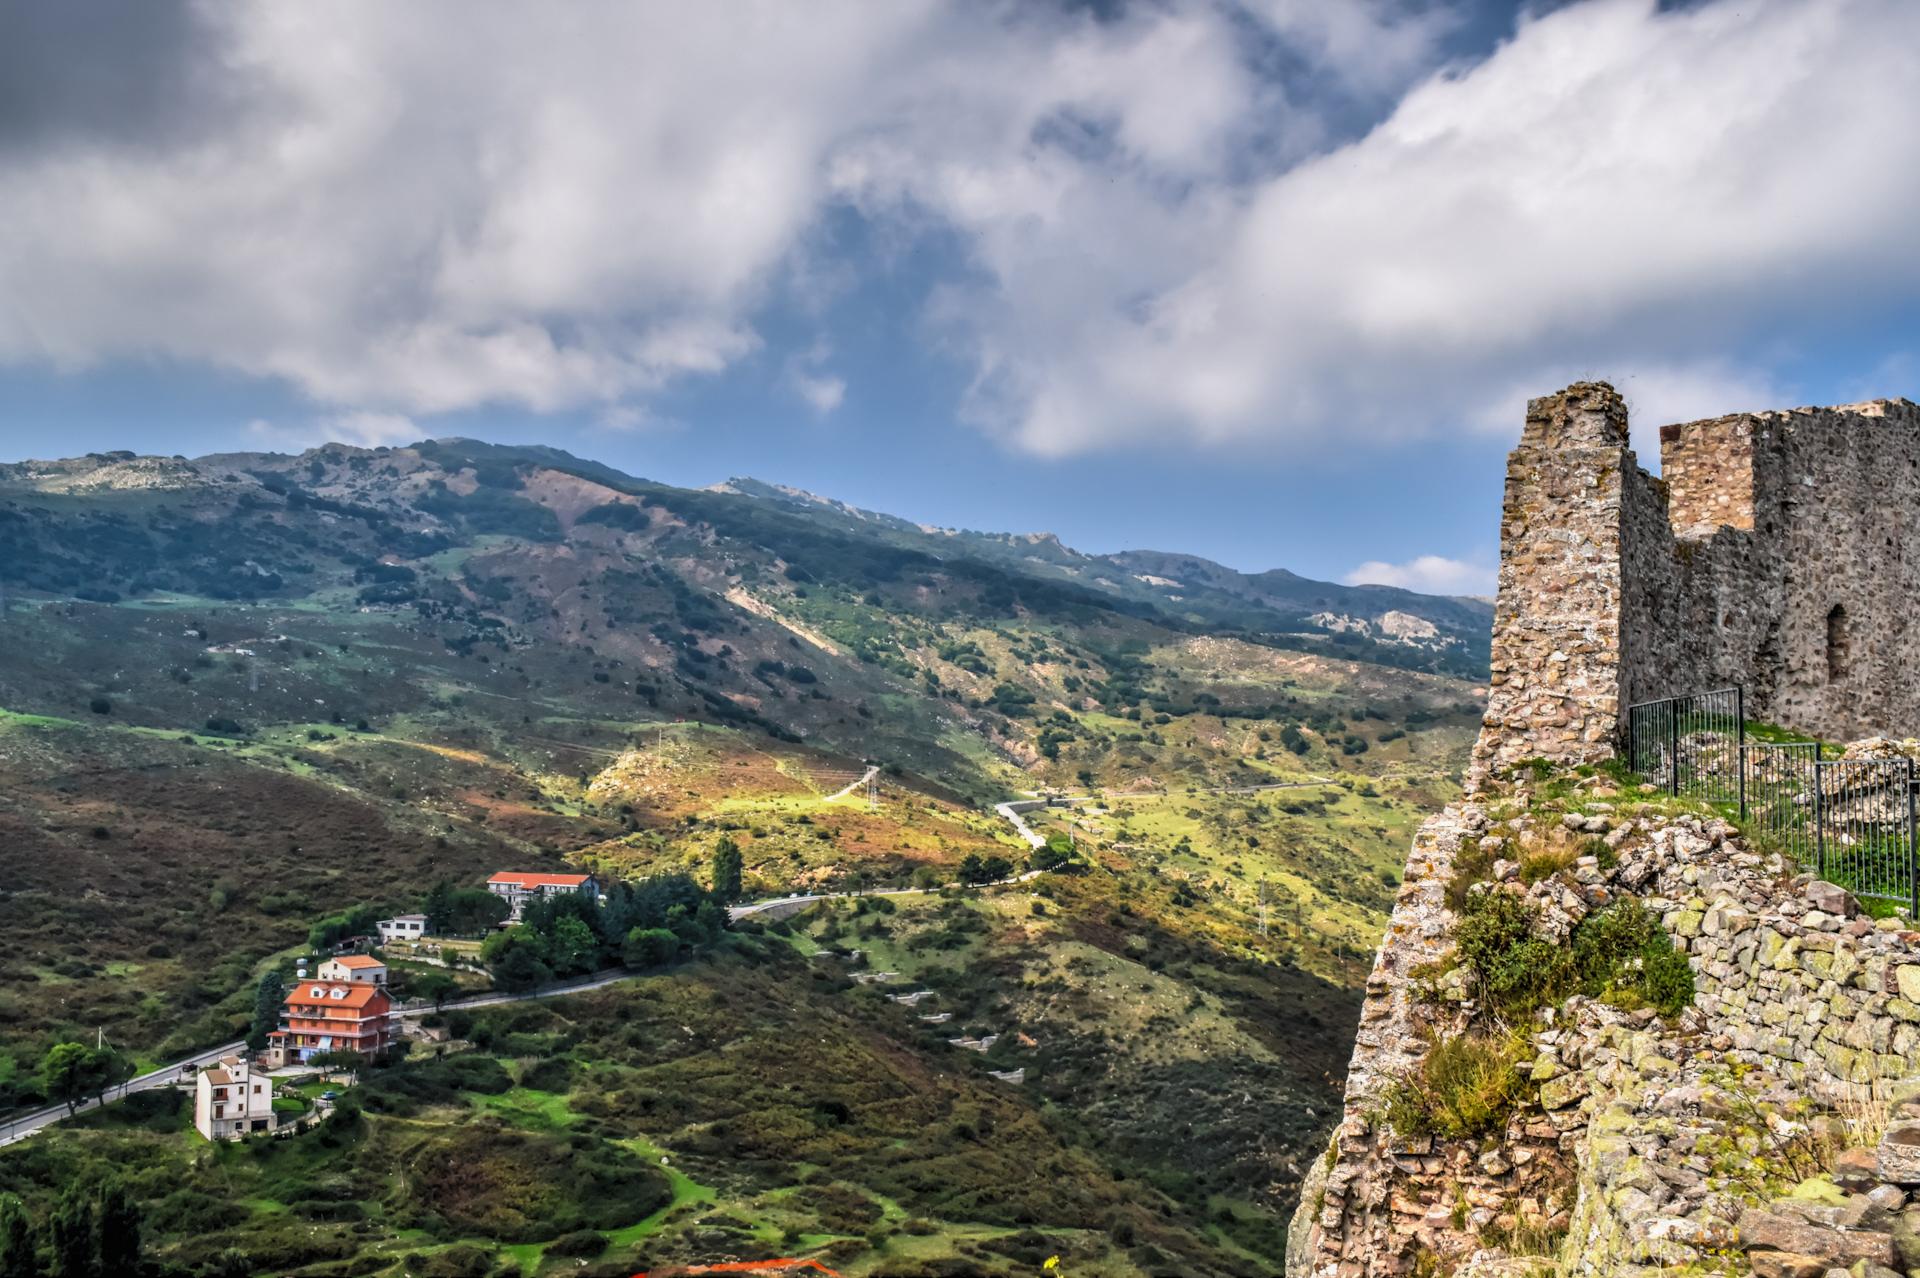 Vue du château de Geraci Siculo